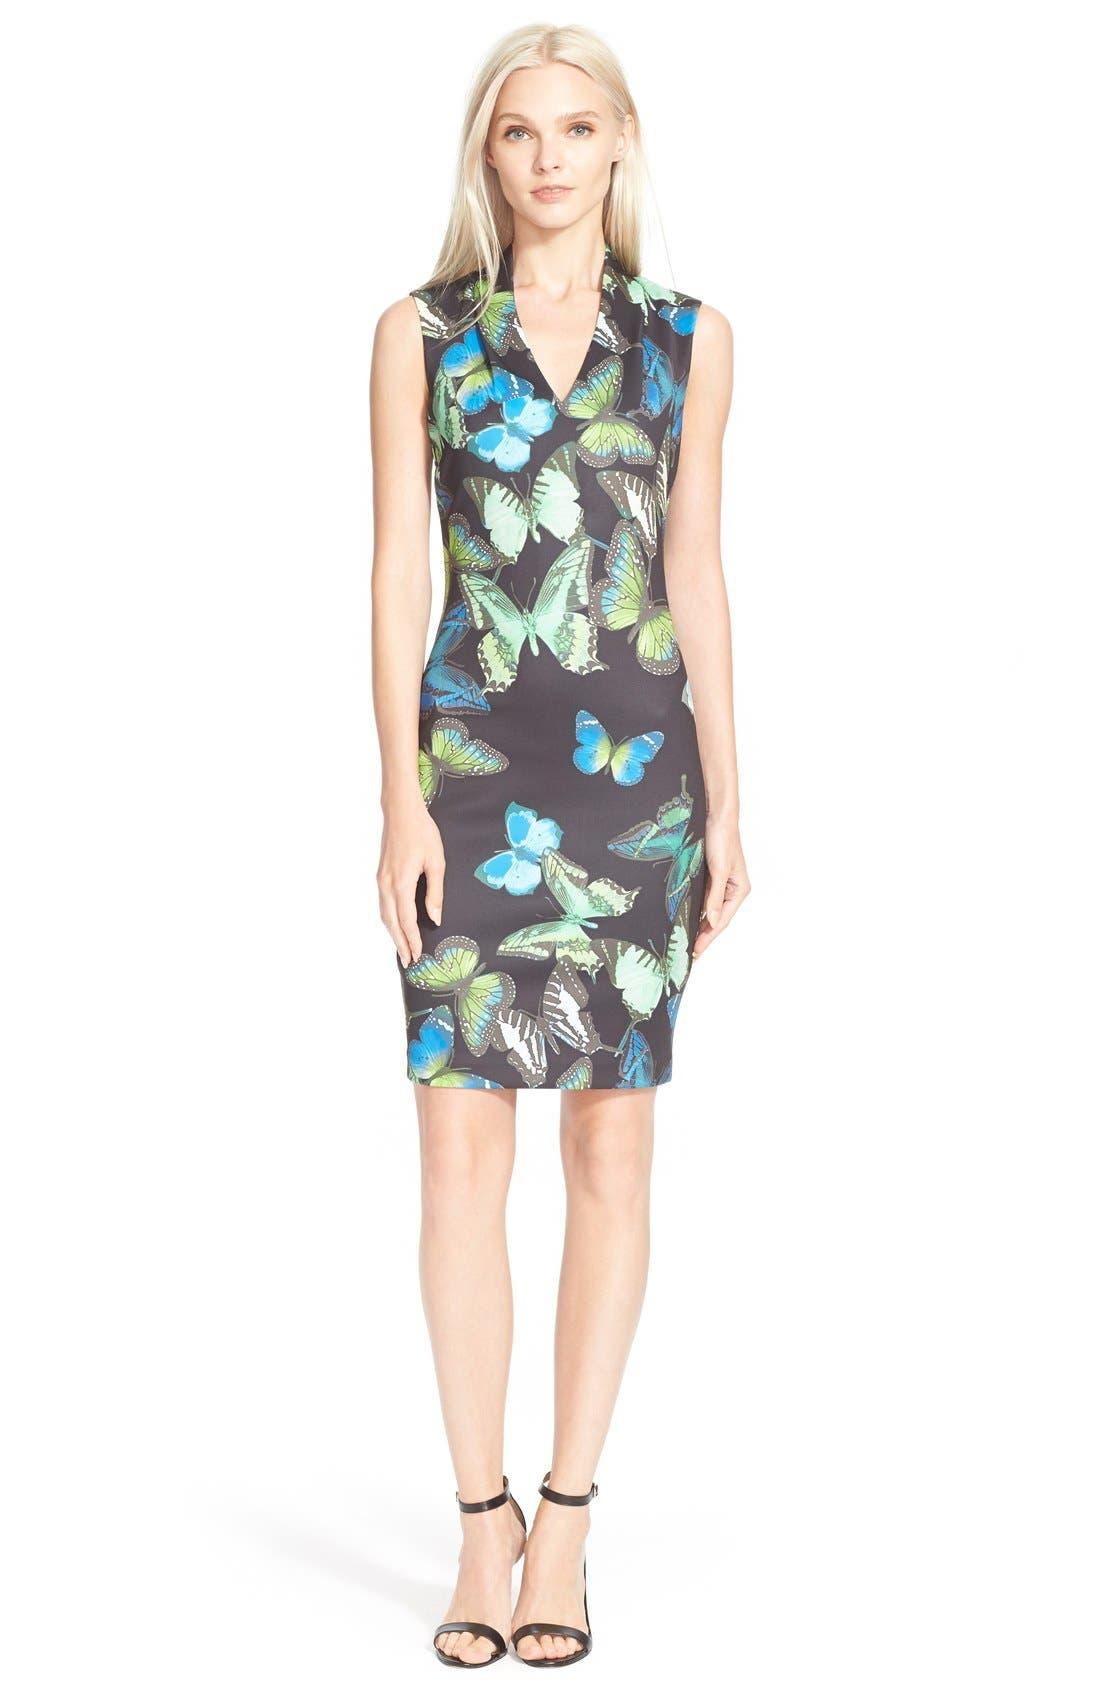 Main Image - Ted Baker London 'Aly' Butterfly Print Neoprene Body-Con Dress